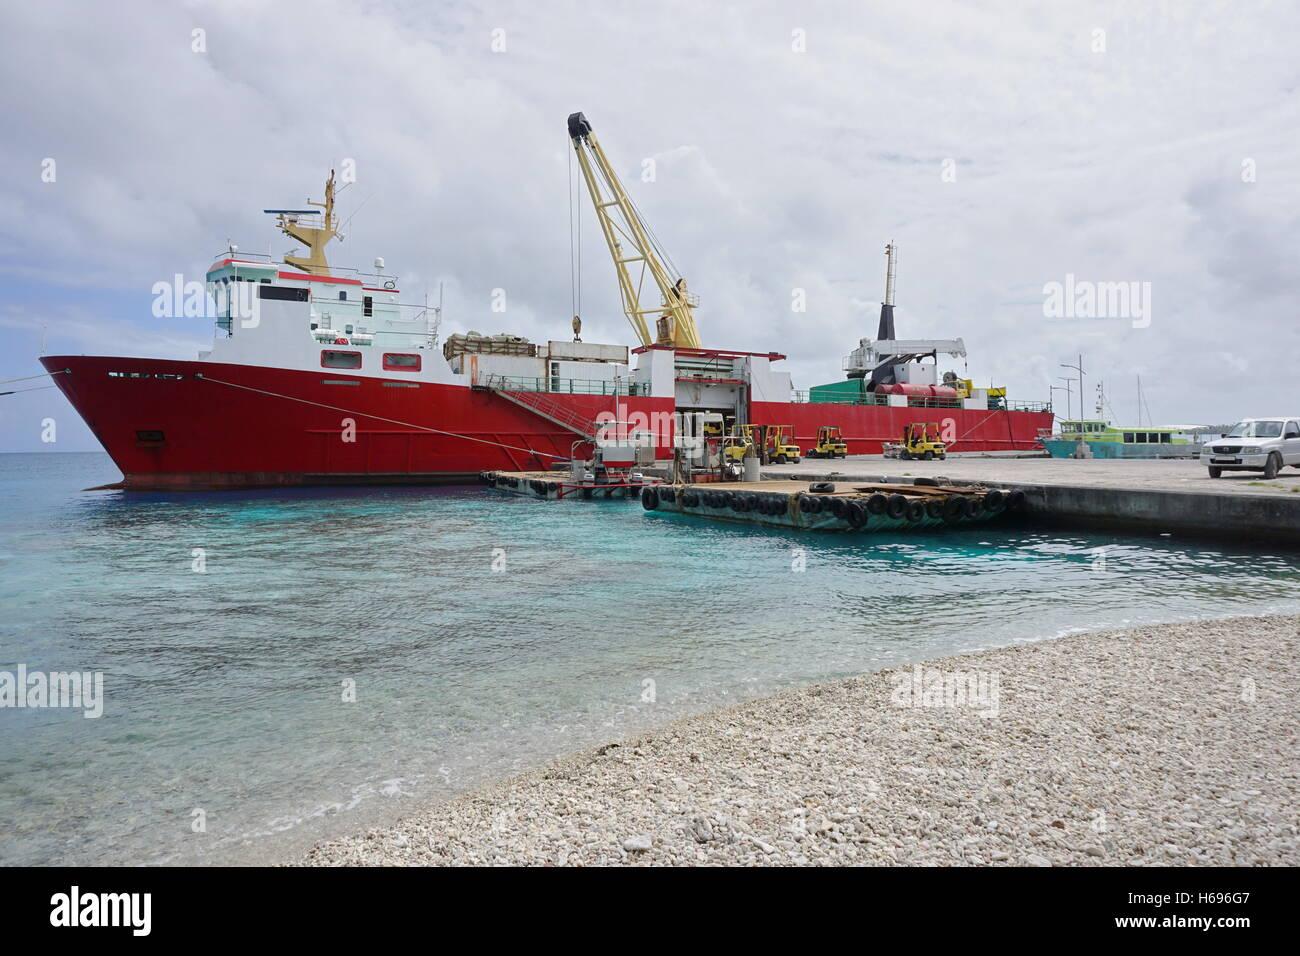 Cargo ship moored to a wharf, atoll of Rangiroa, Tuamotu archipelago, French Polynesia - Stock Image